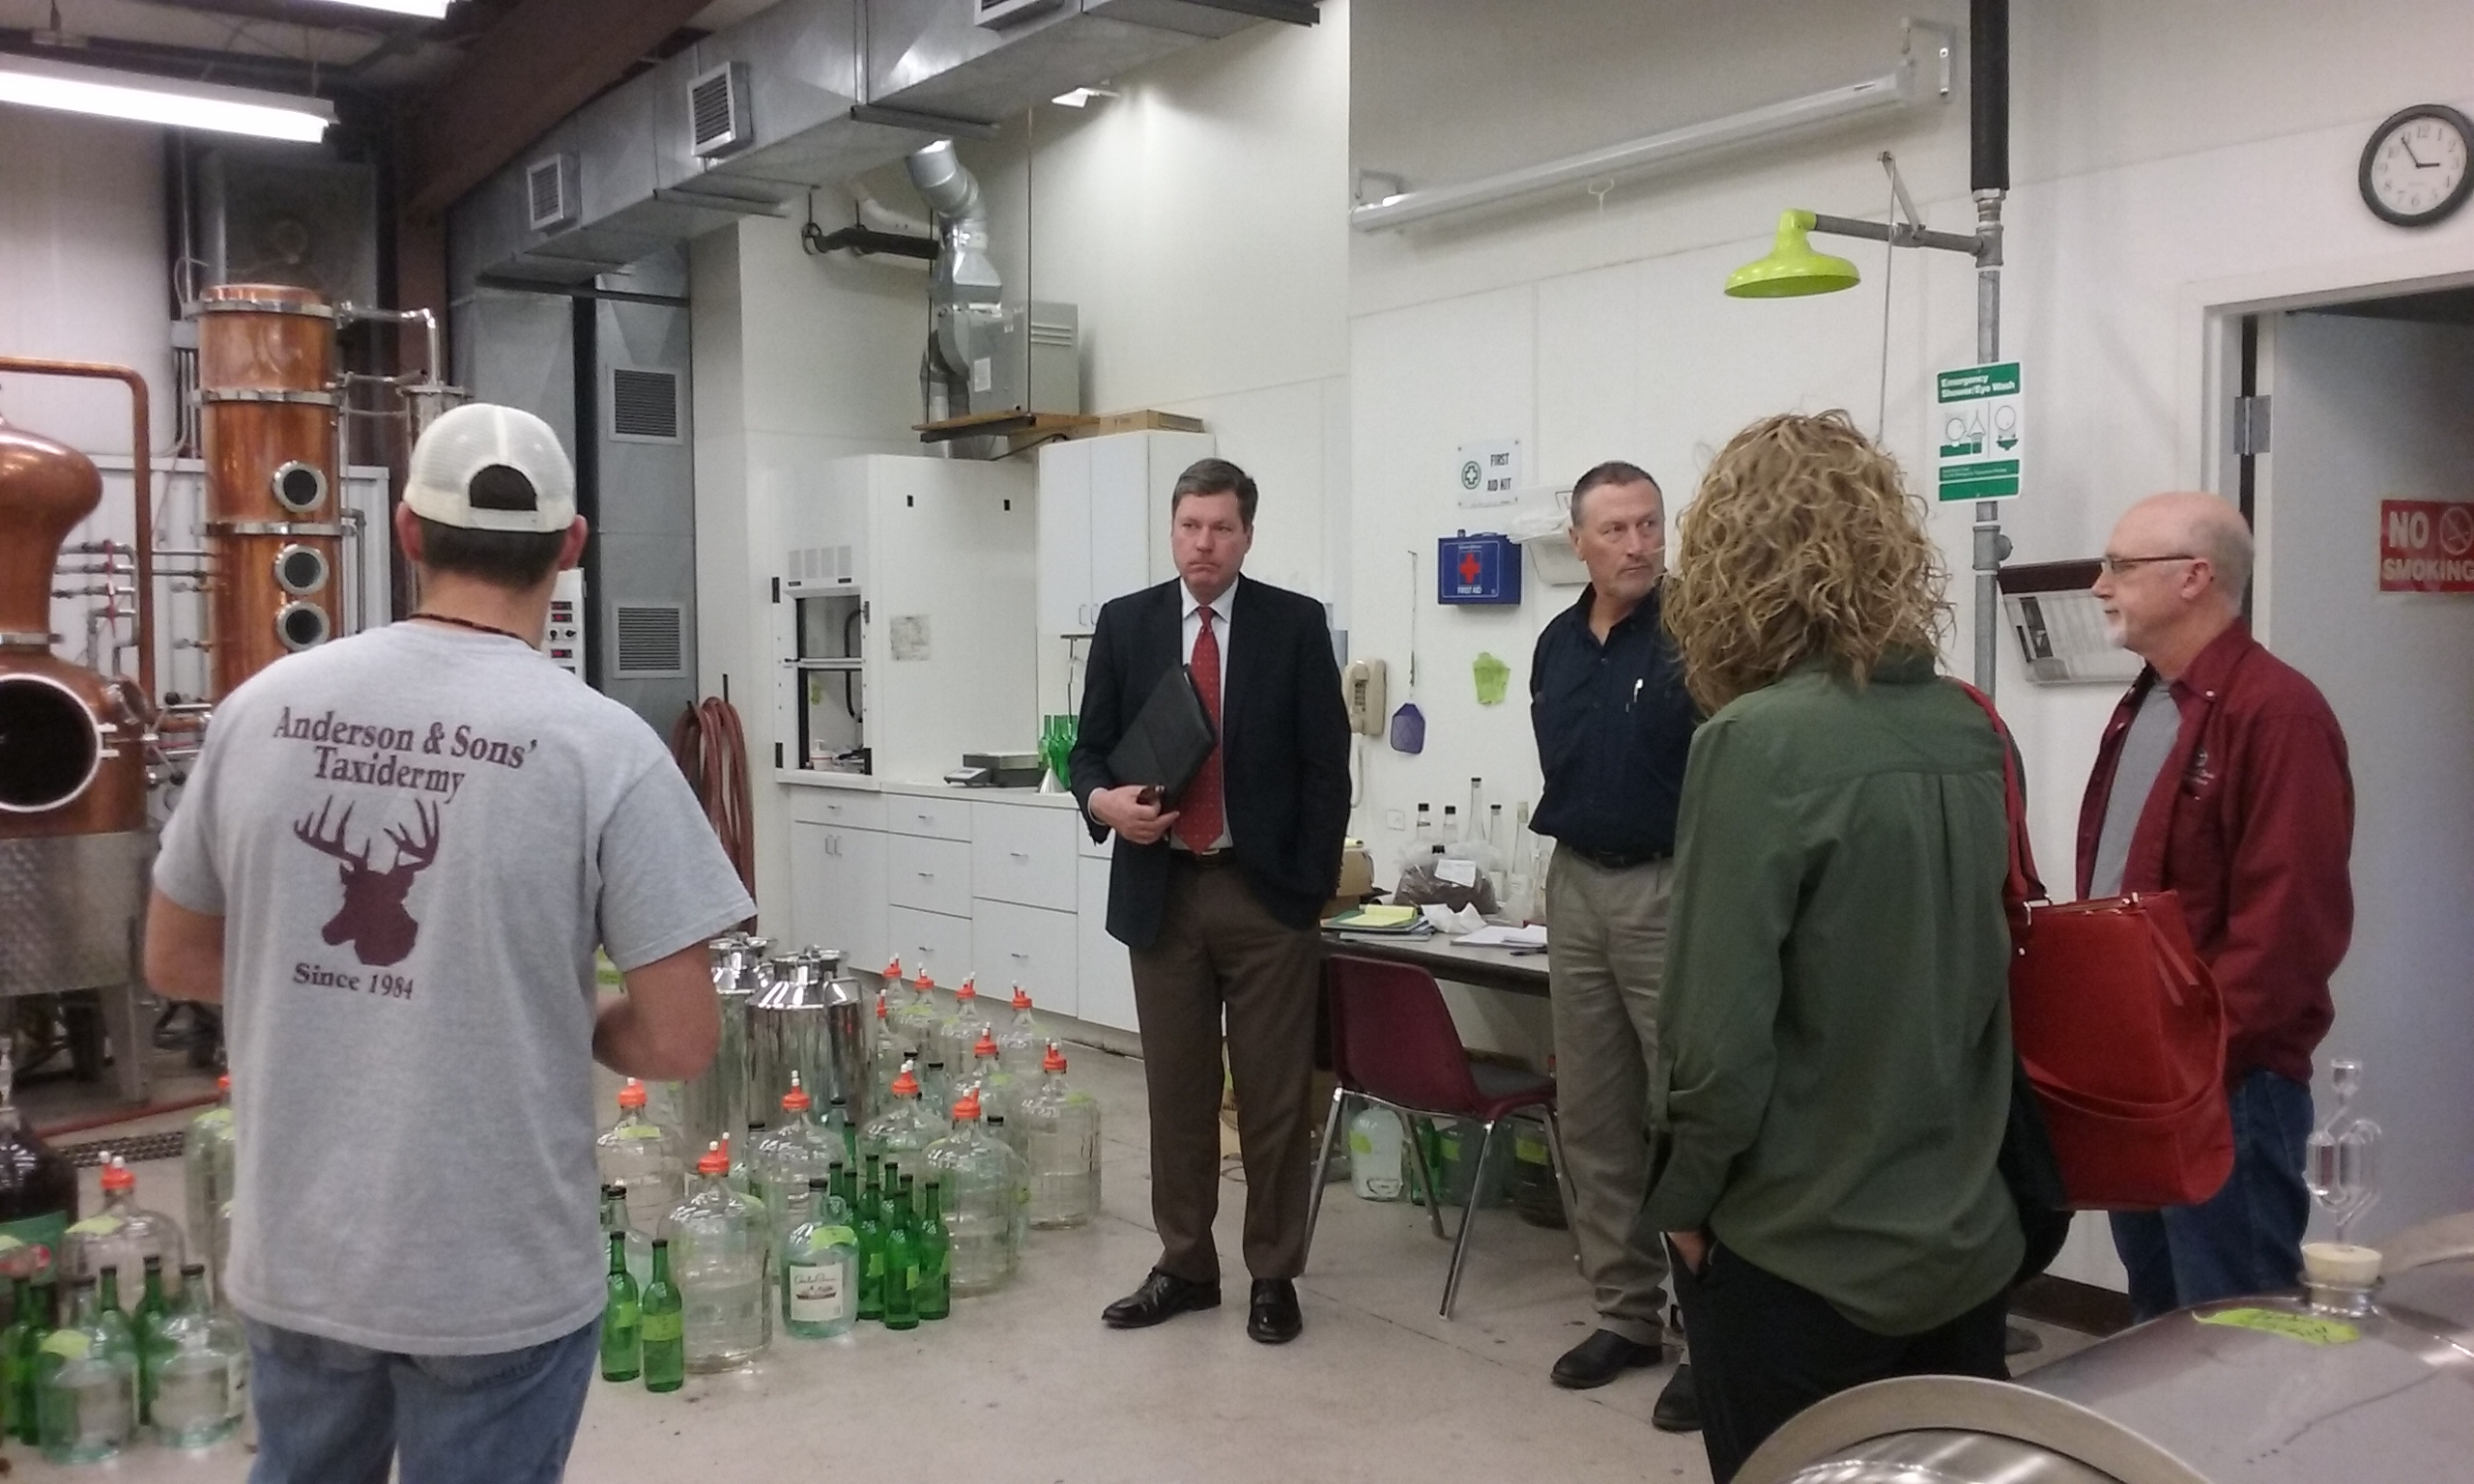 Dr. James Baker, Dr. Erin Parrish and Thomas Downs, Esq. Visit the Fruit Station